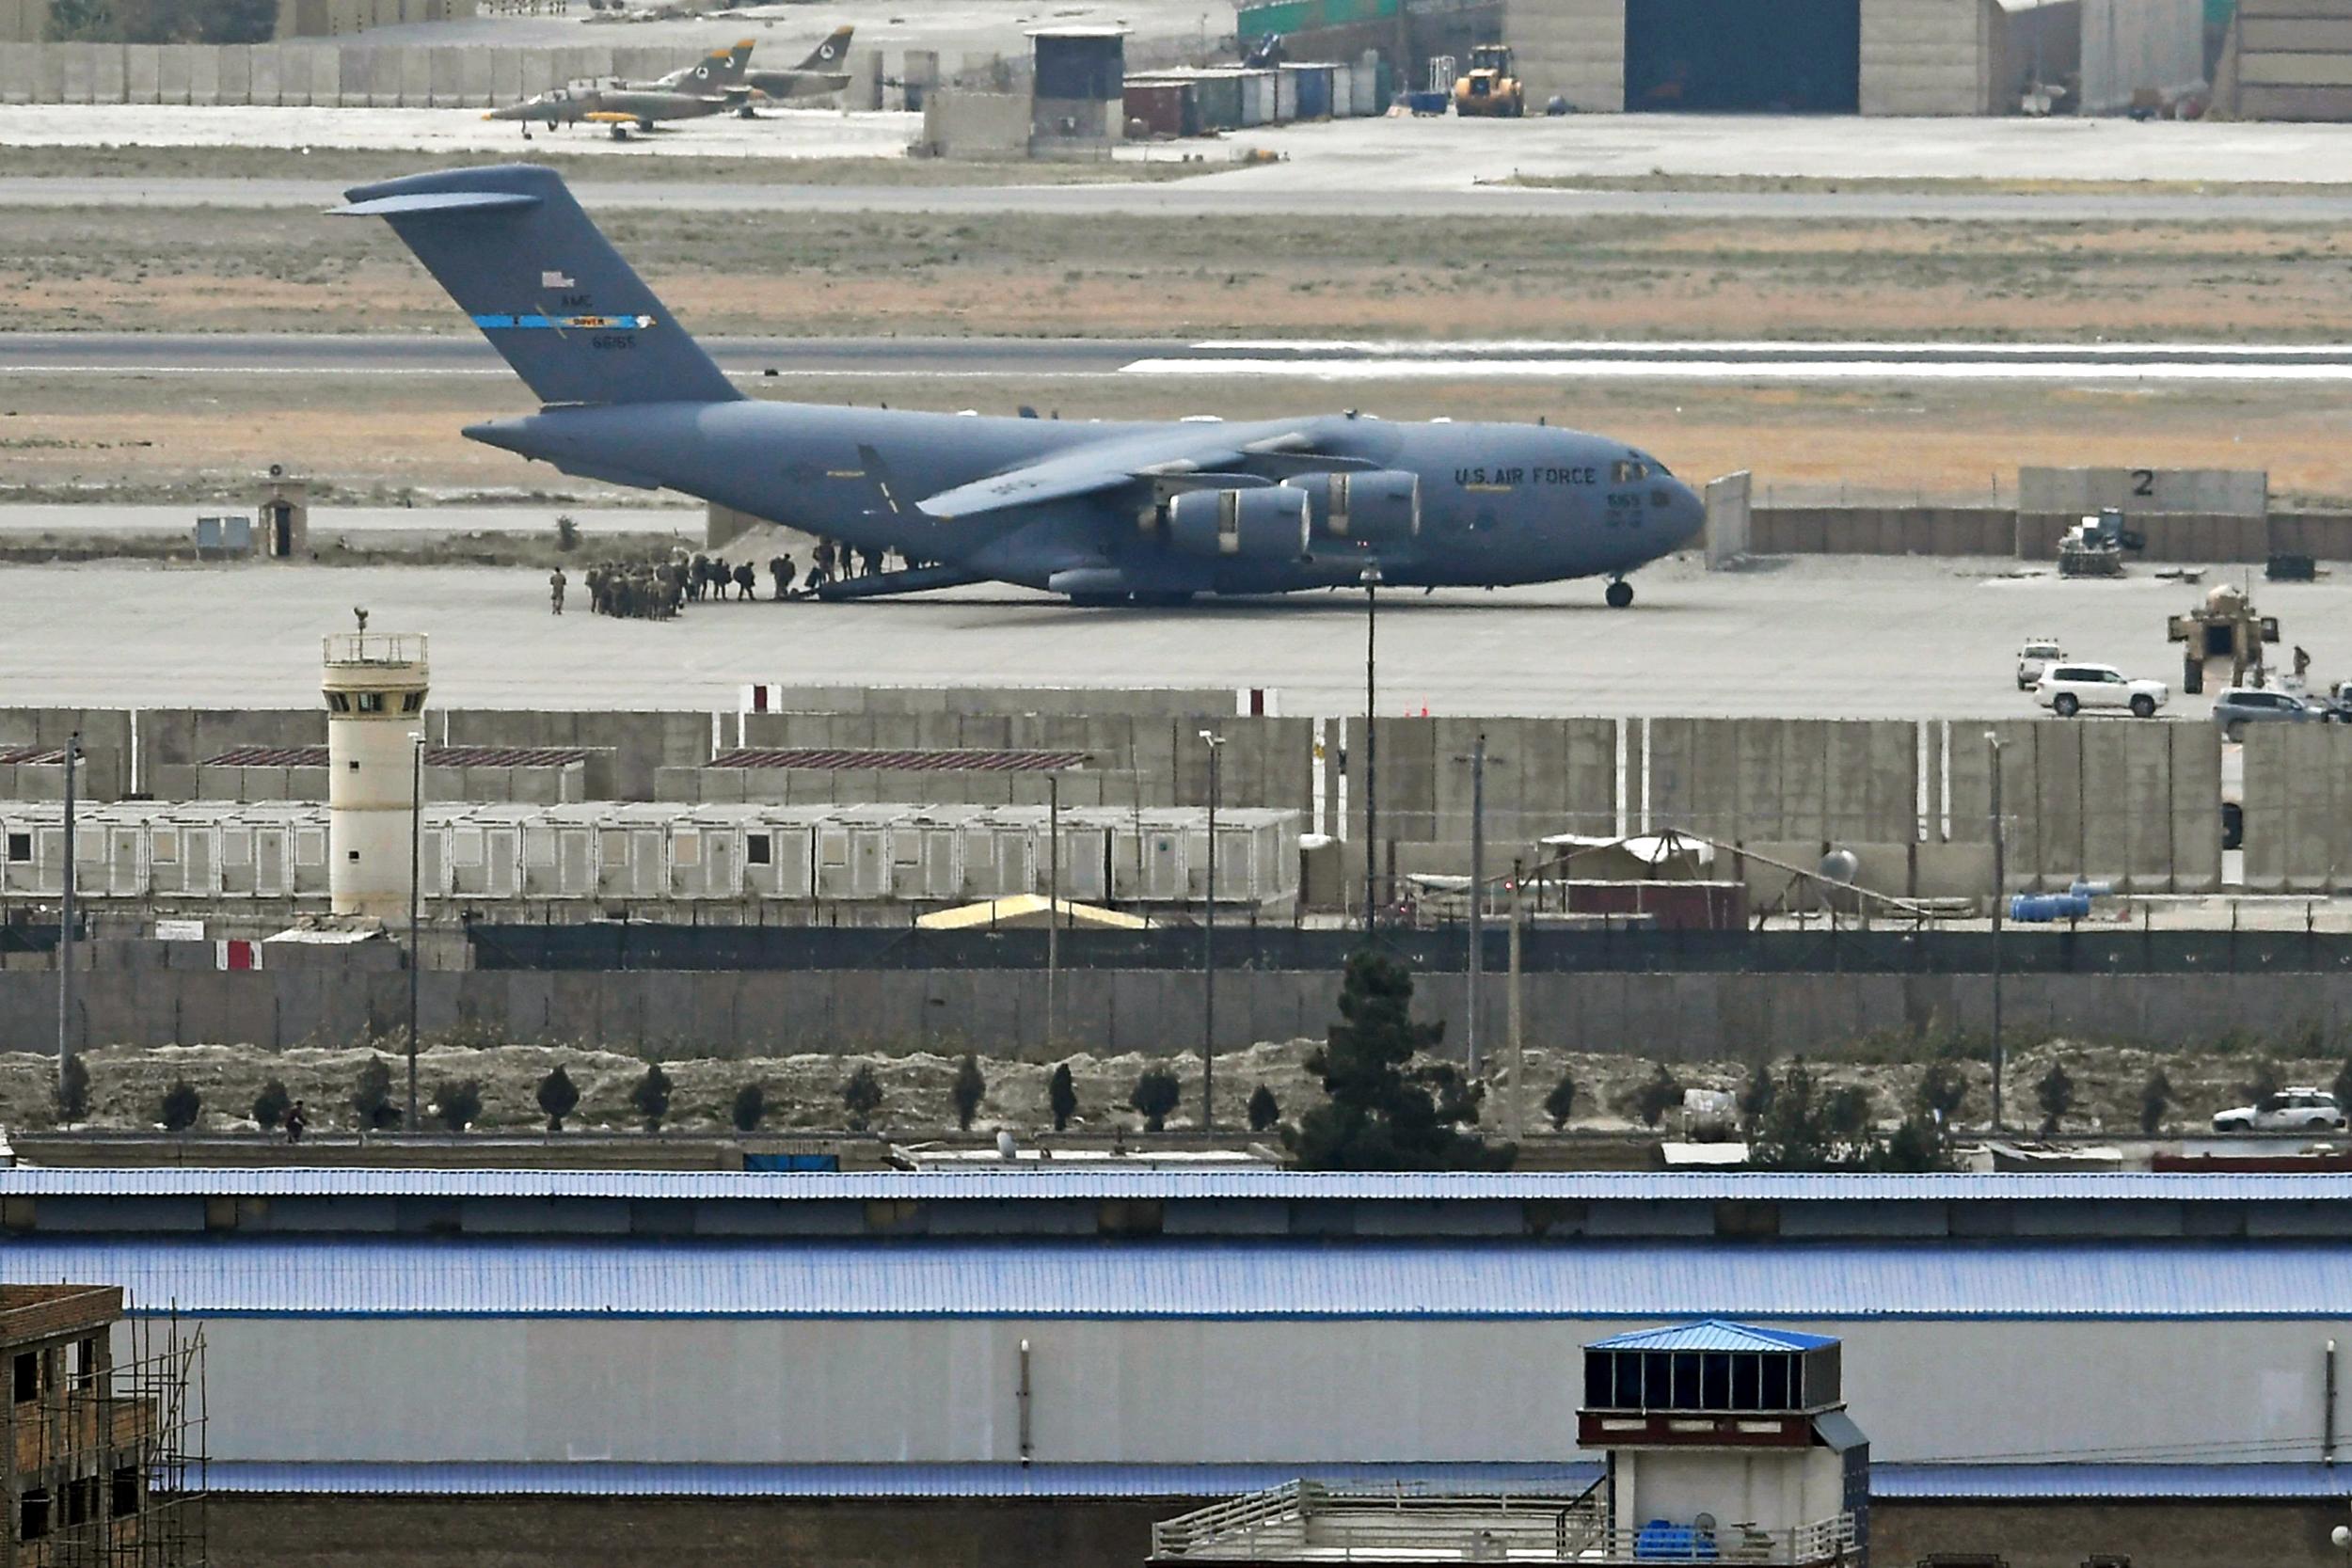 Rockets fired toward Kabul airport; U.S. evacuation 'uninterrupted'